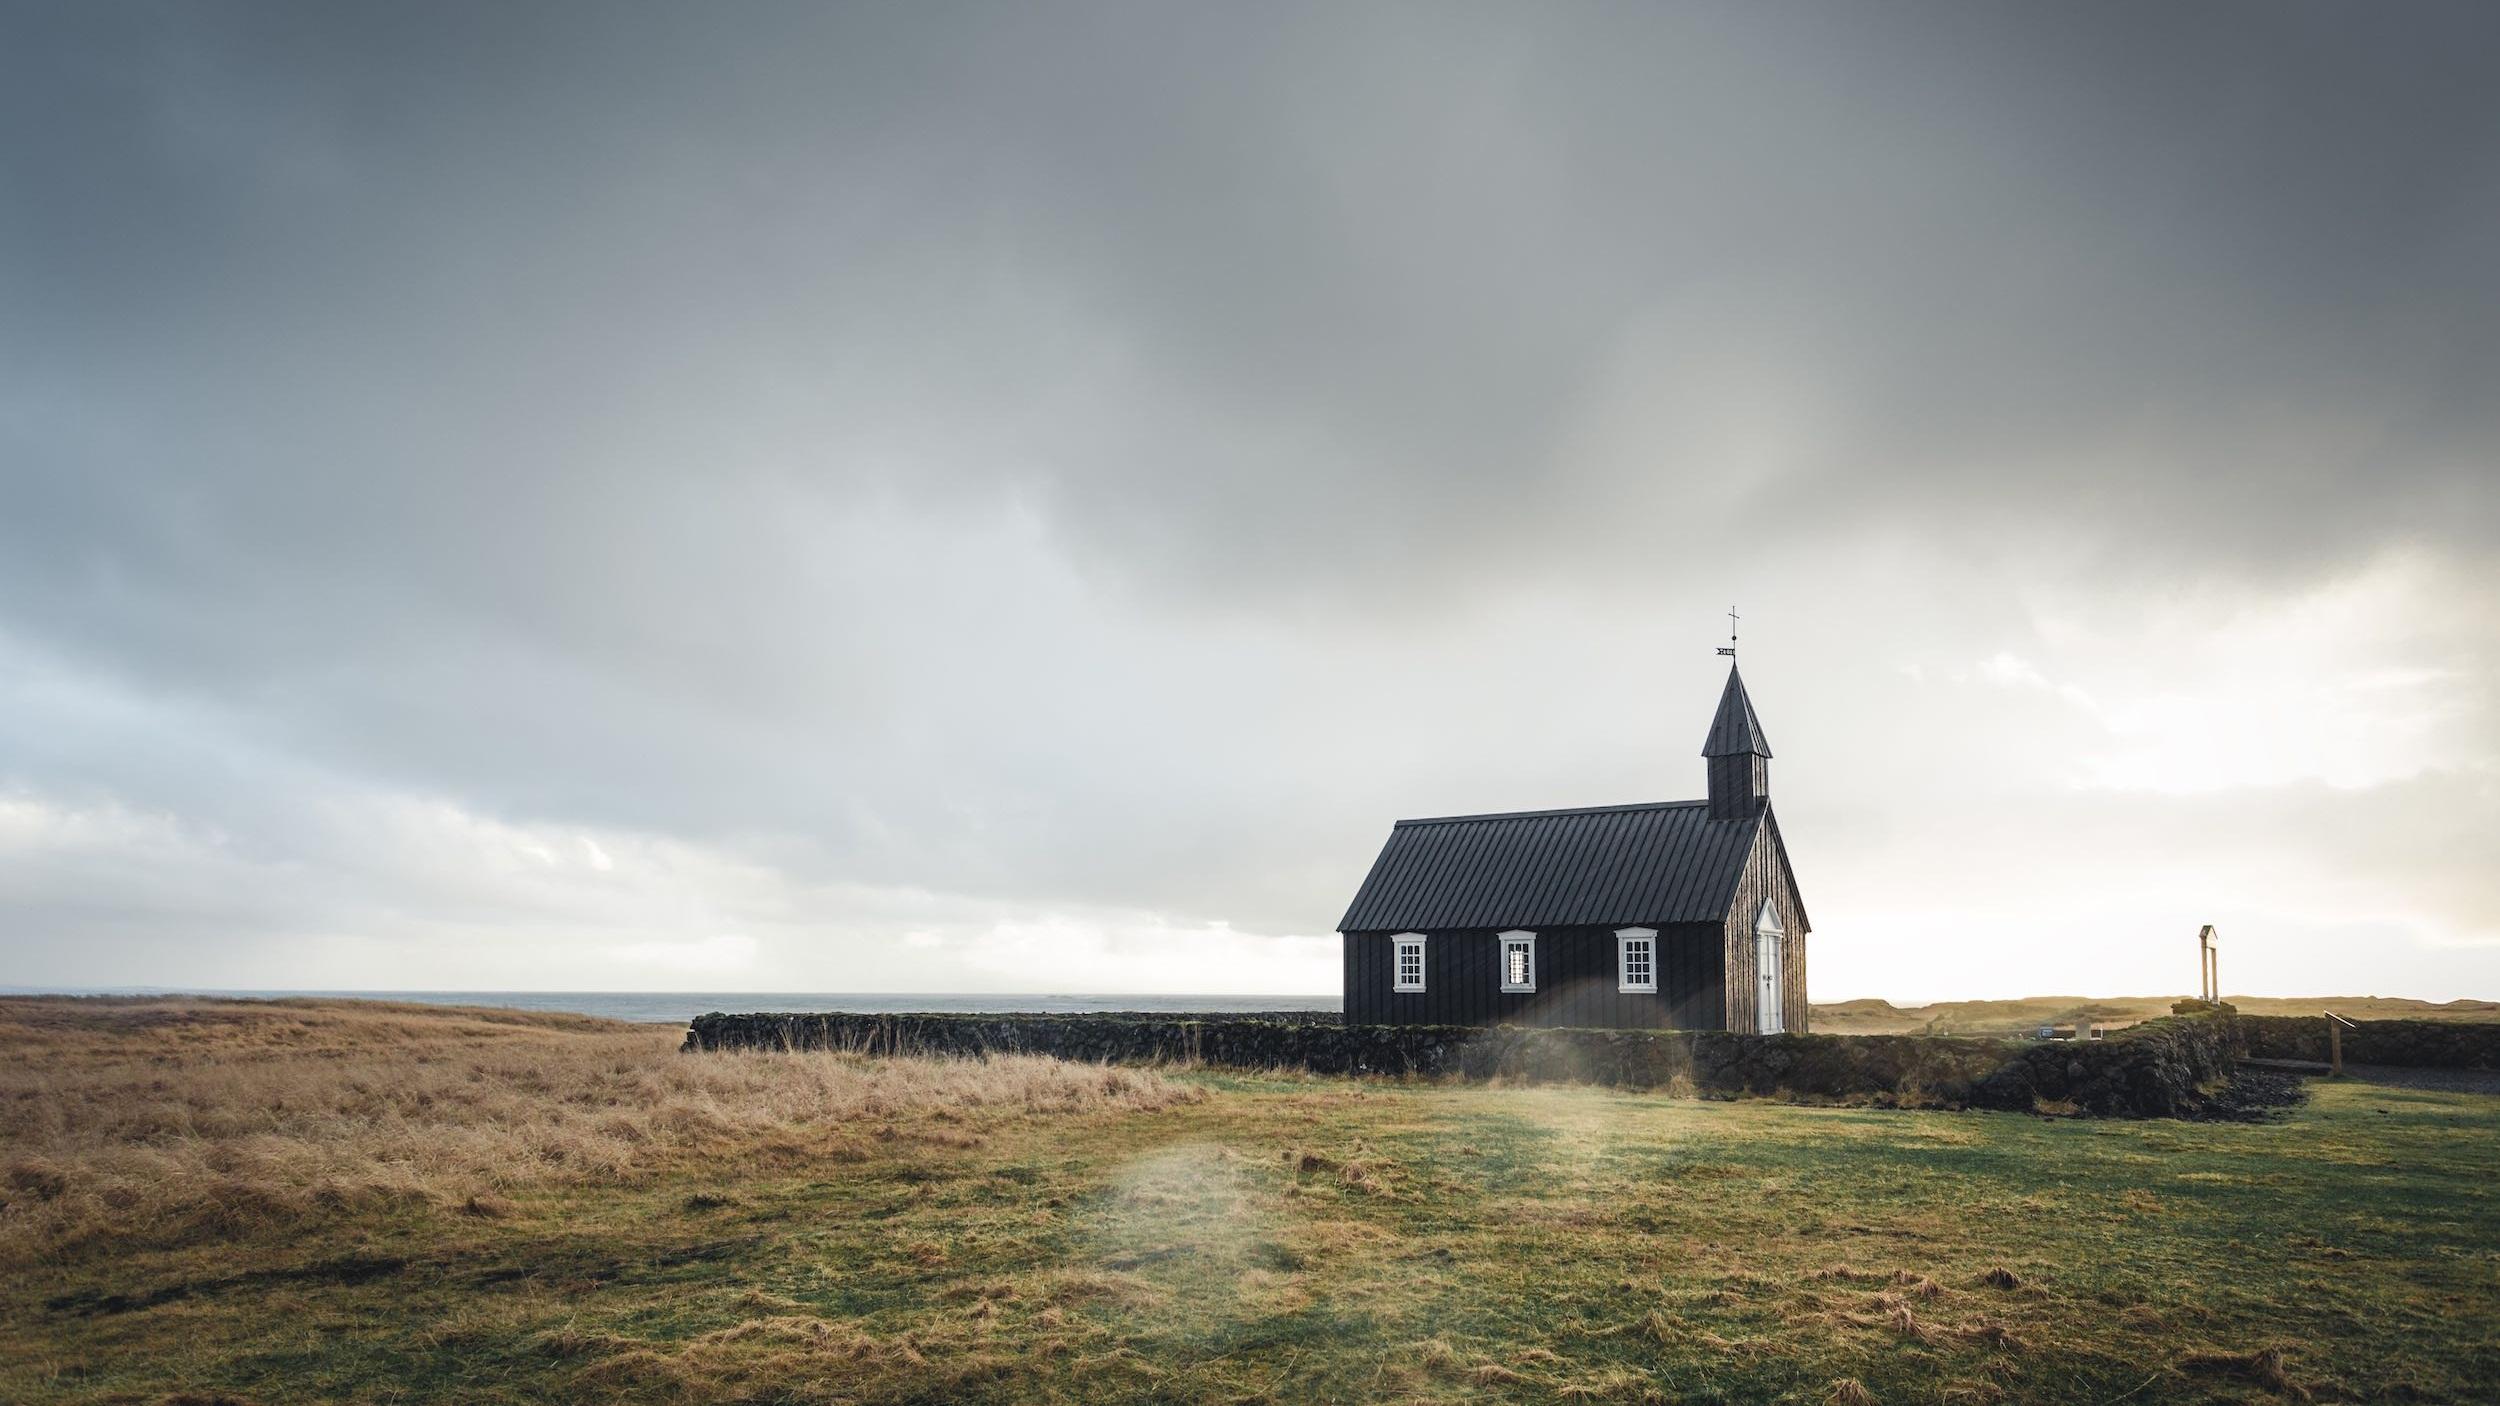 A small church in a stark landscape